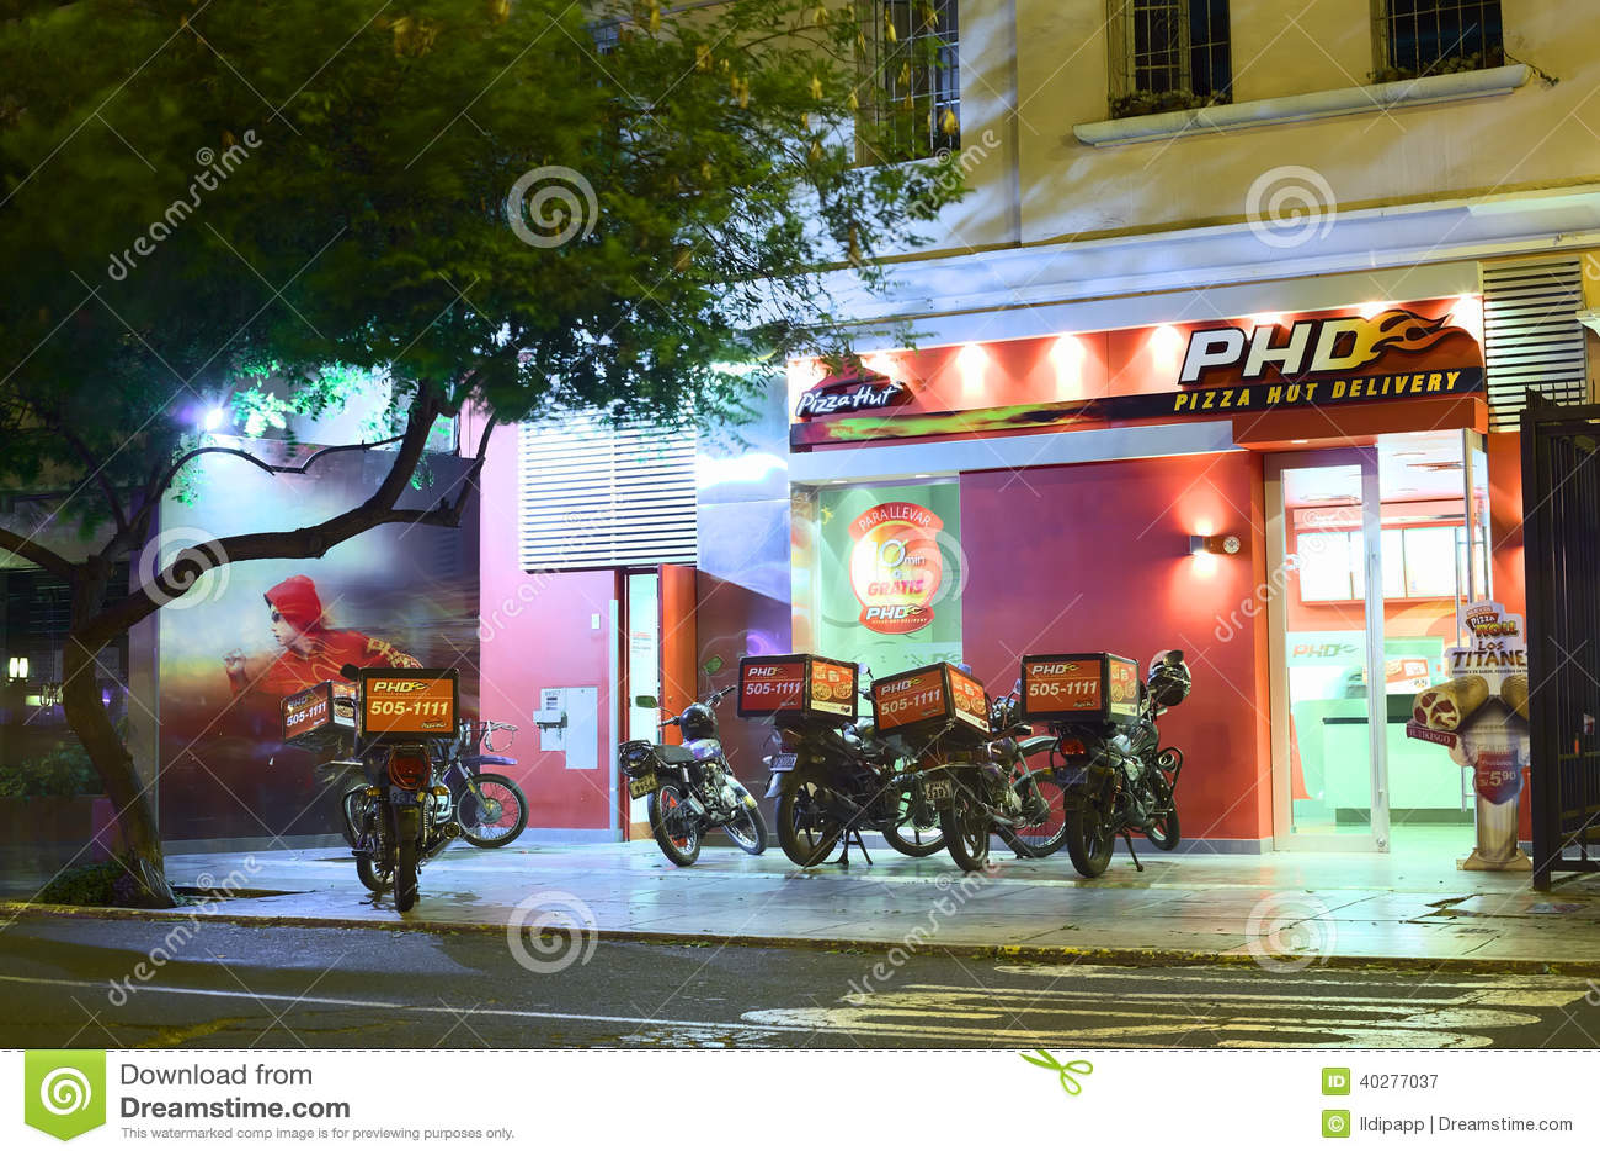 Pizza Hut Delivery In Miraflores Lima Peru Editorial Photography